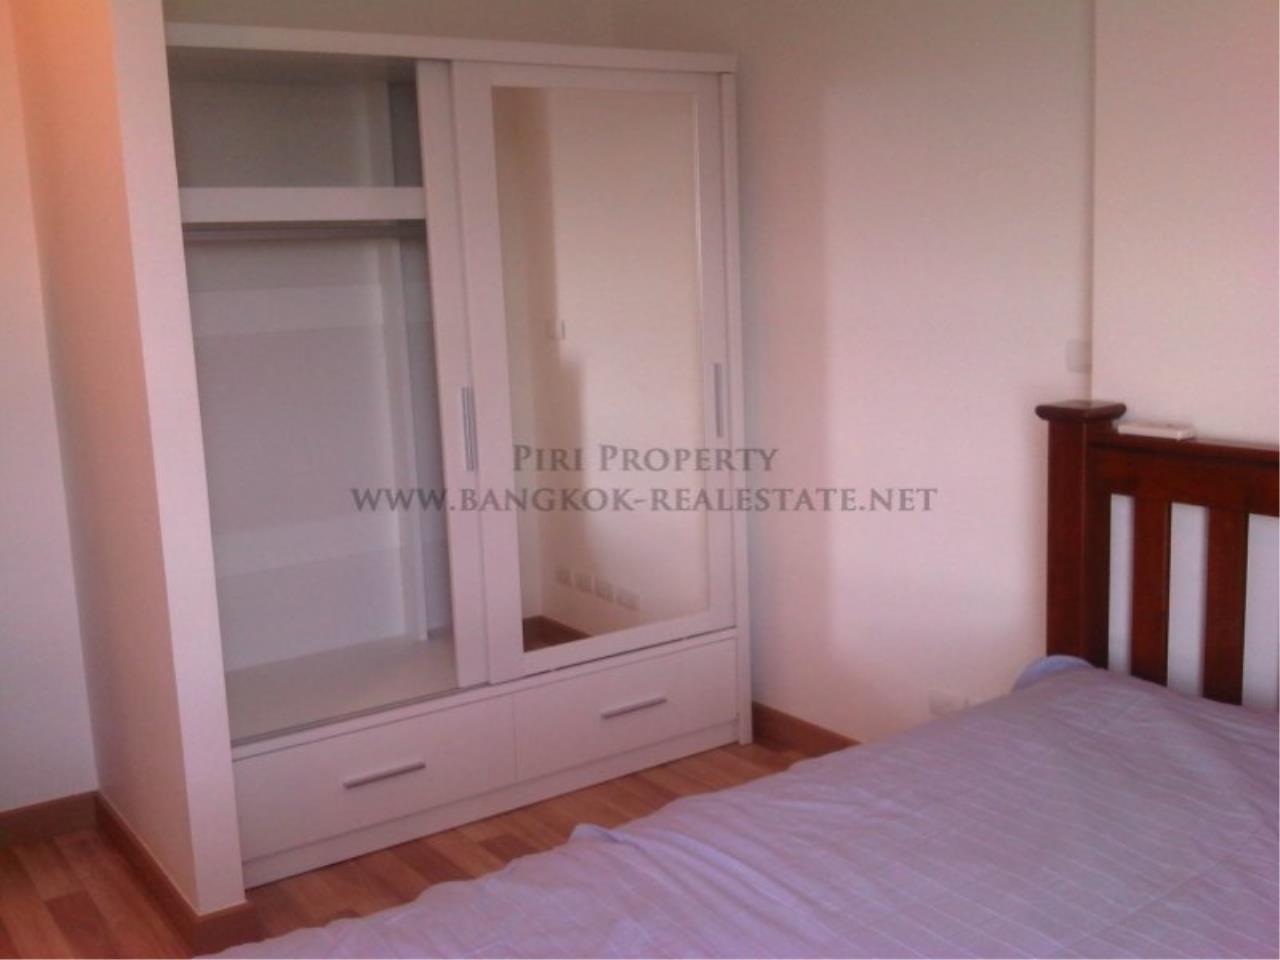 Piri Property Agency's 2 Bedroom - Modern and Brand New - IDEO Verve 3